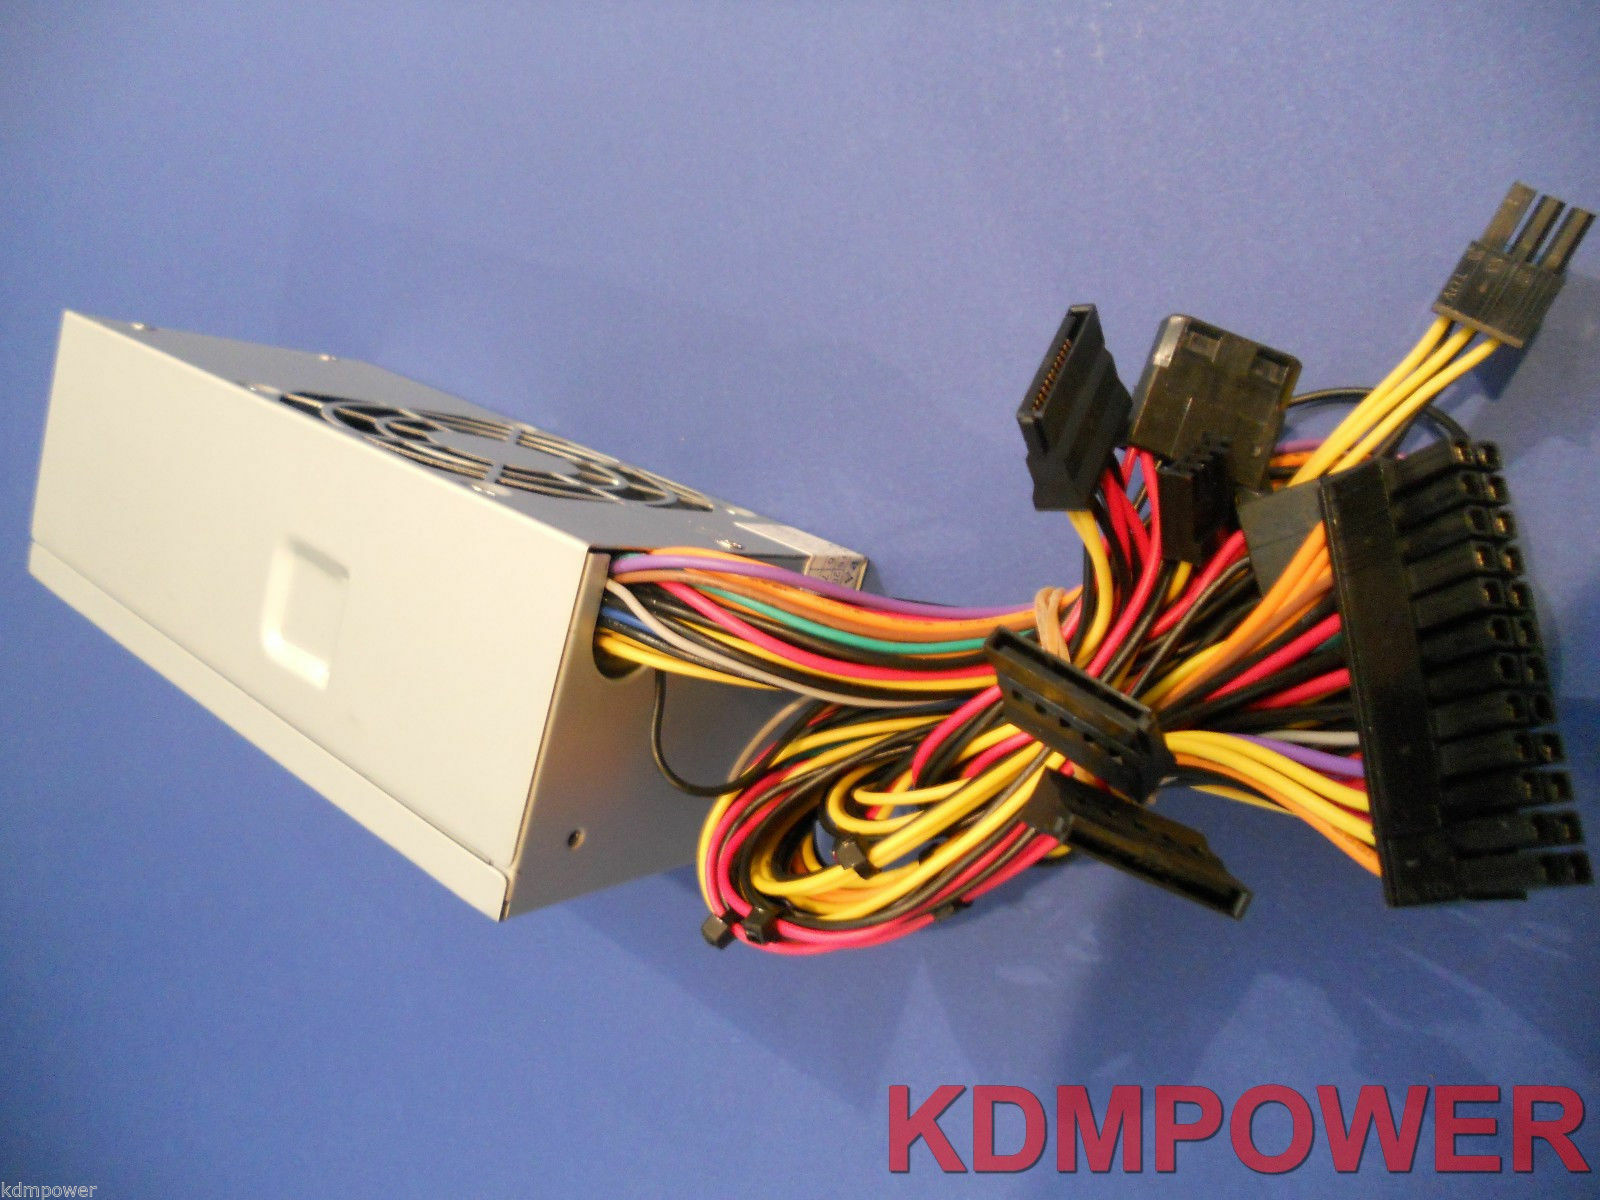 AcBel 250Watt Power Supply PC6036 0XW604  TESTED